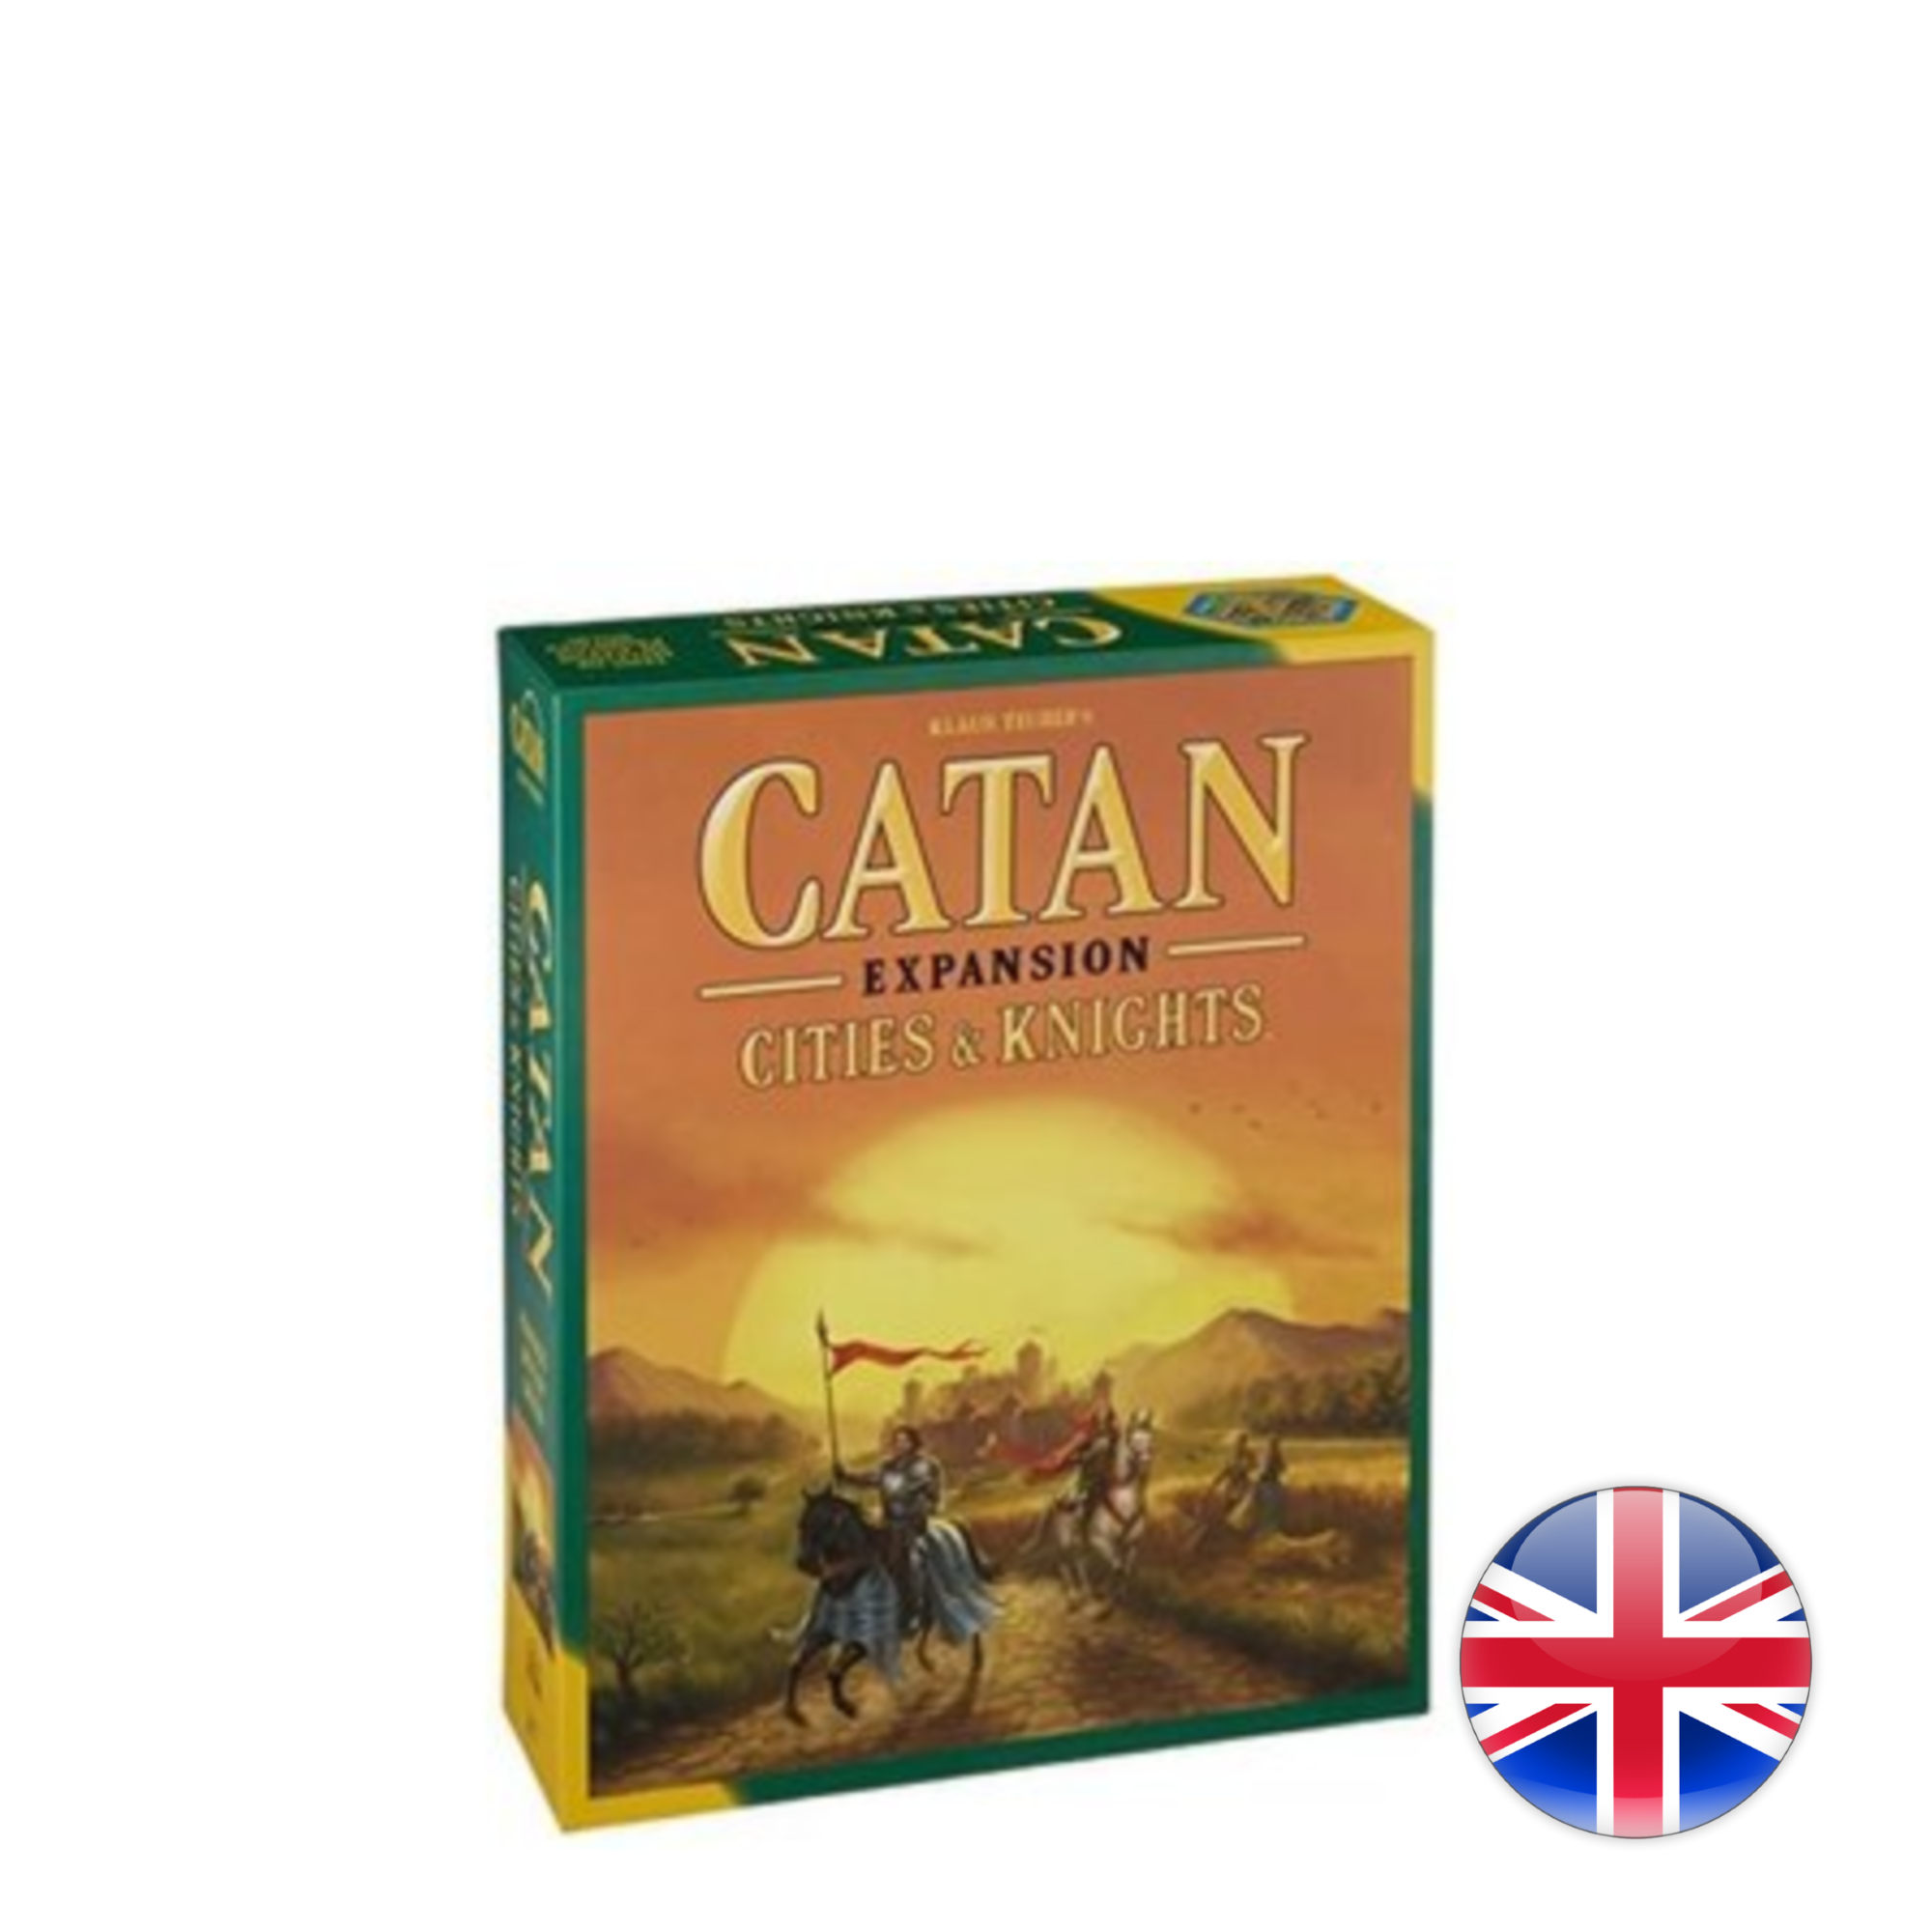 Catan Studios Catan - Exp. Cities & Knights - 5/6 Player